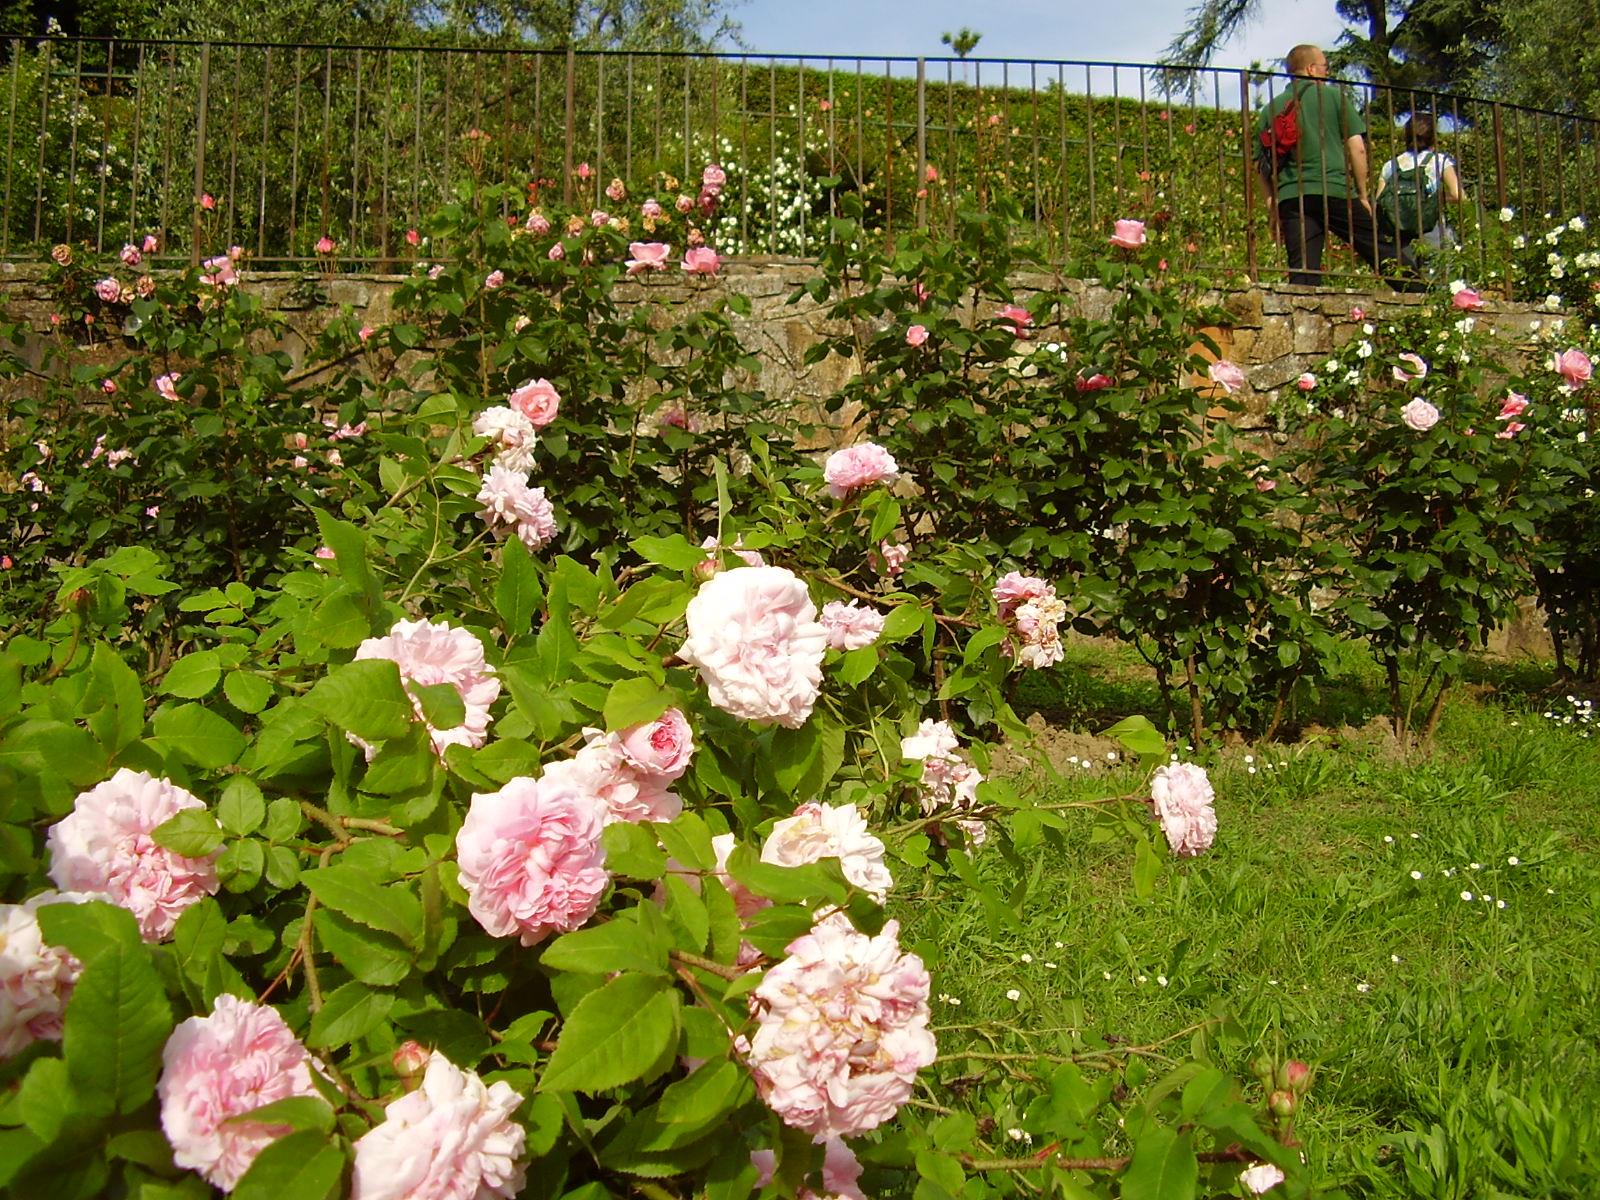 giardino-delle-rose-3